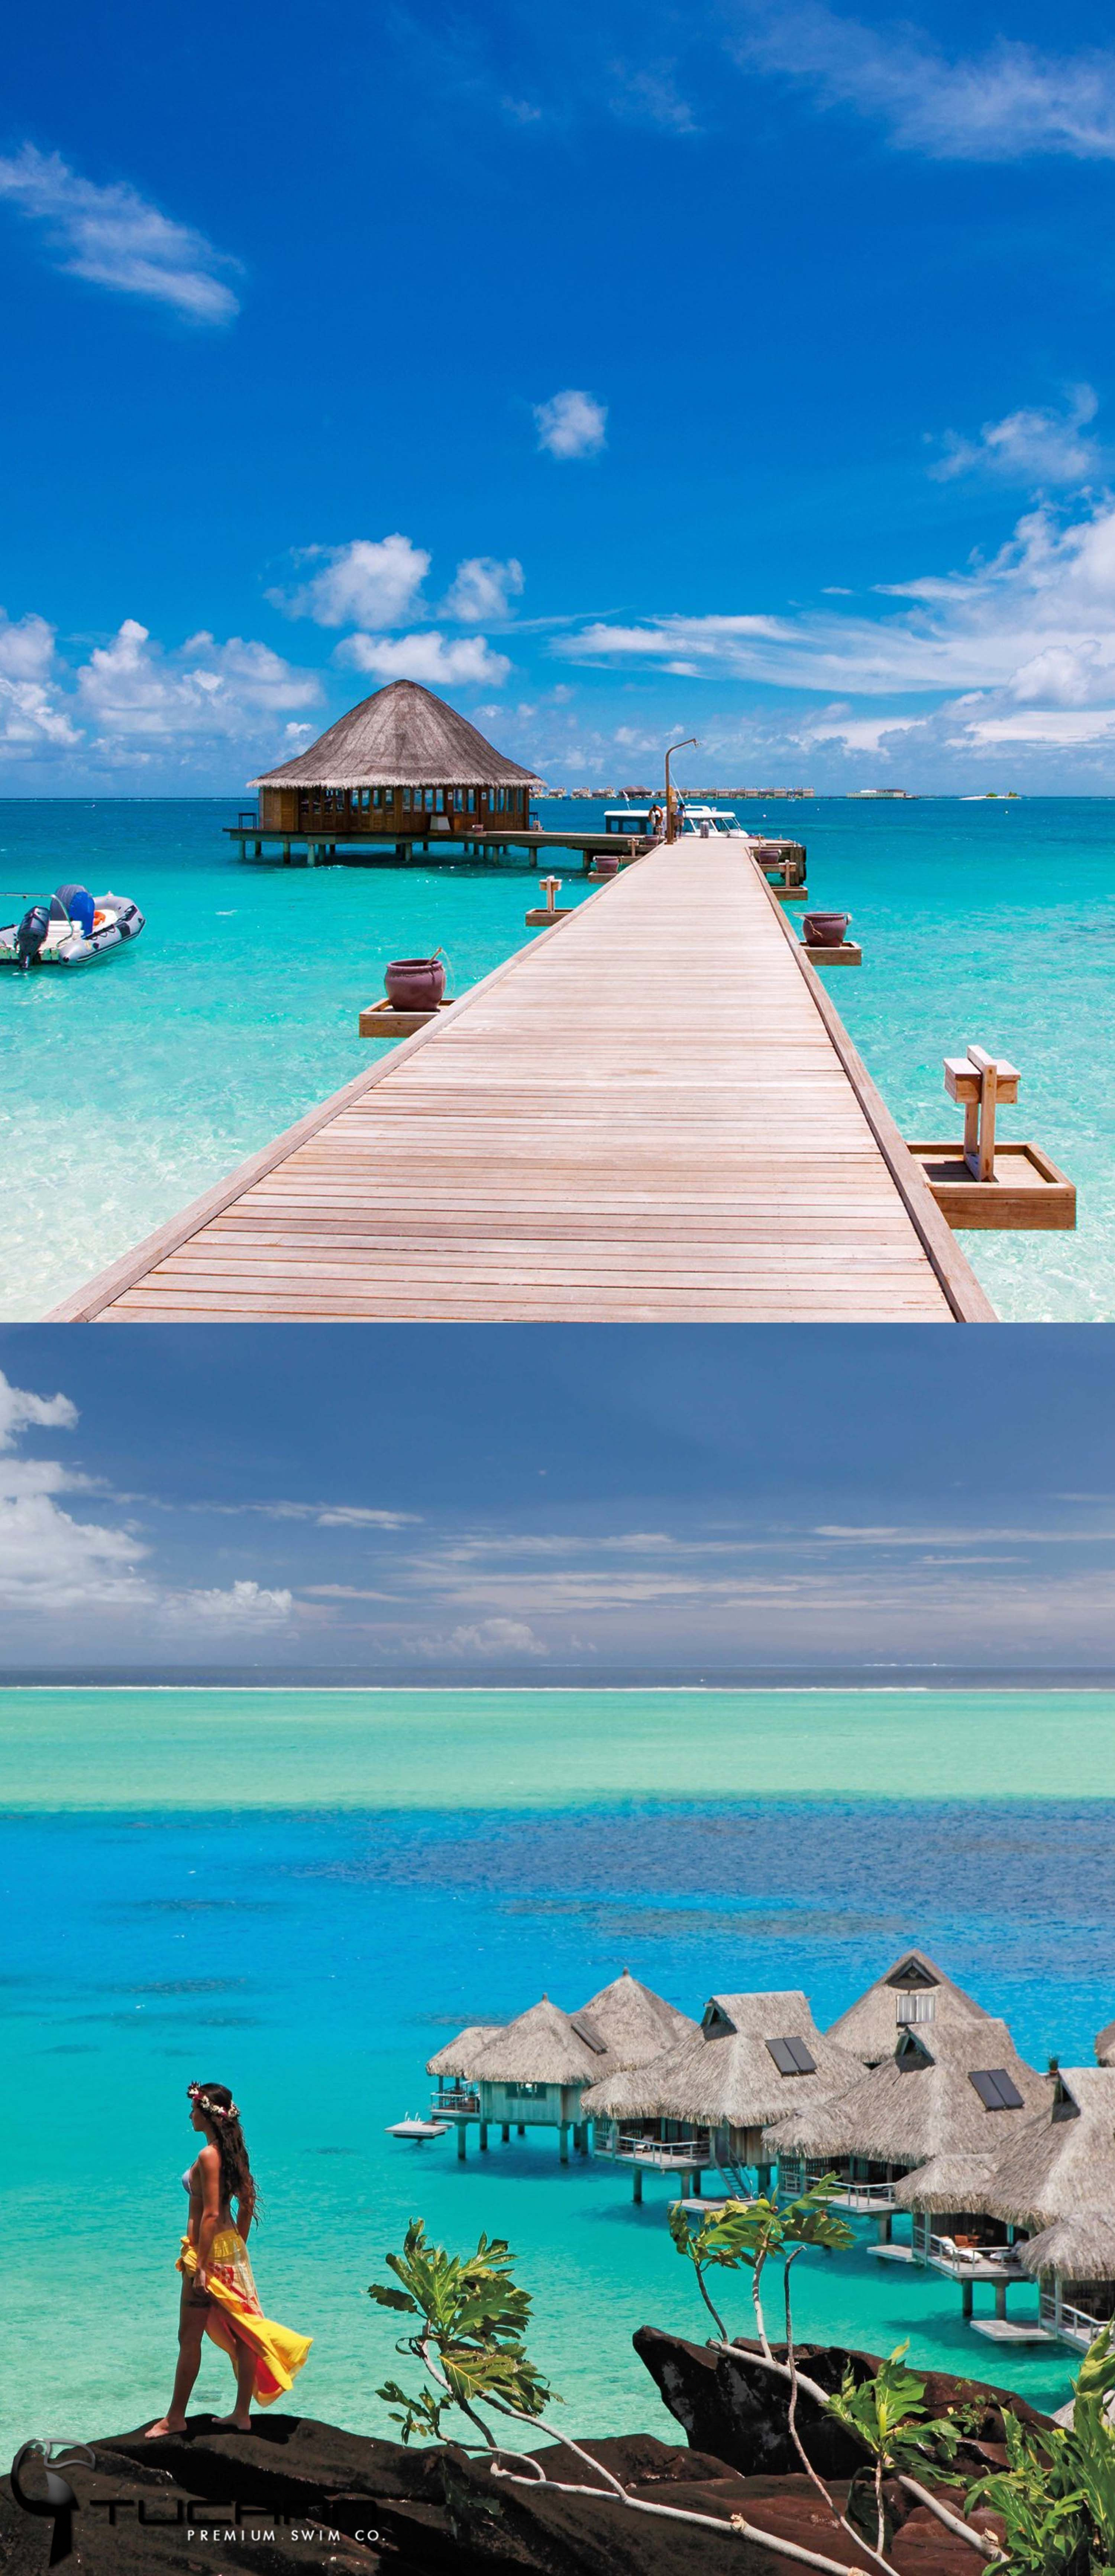 201f504786 #tucann #beach #fun #tucann #party #holiday #vacation #lifestyle #beachlife  #beachfun #seabeach #shorts #swimwear #surfing #yoga #fashion